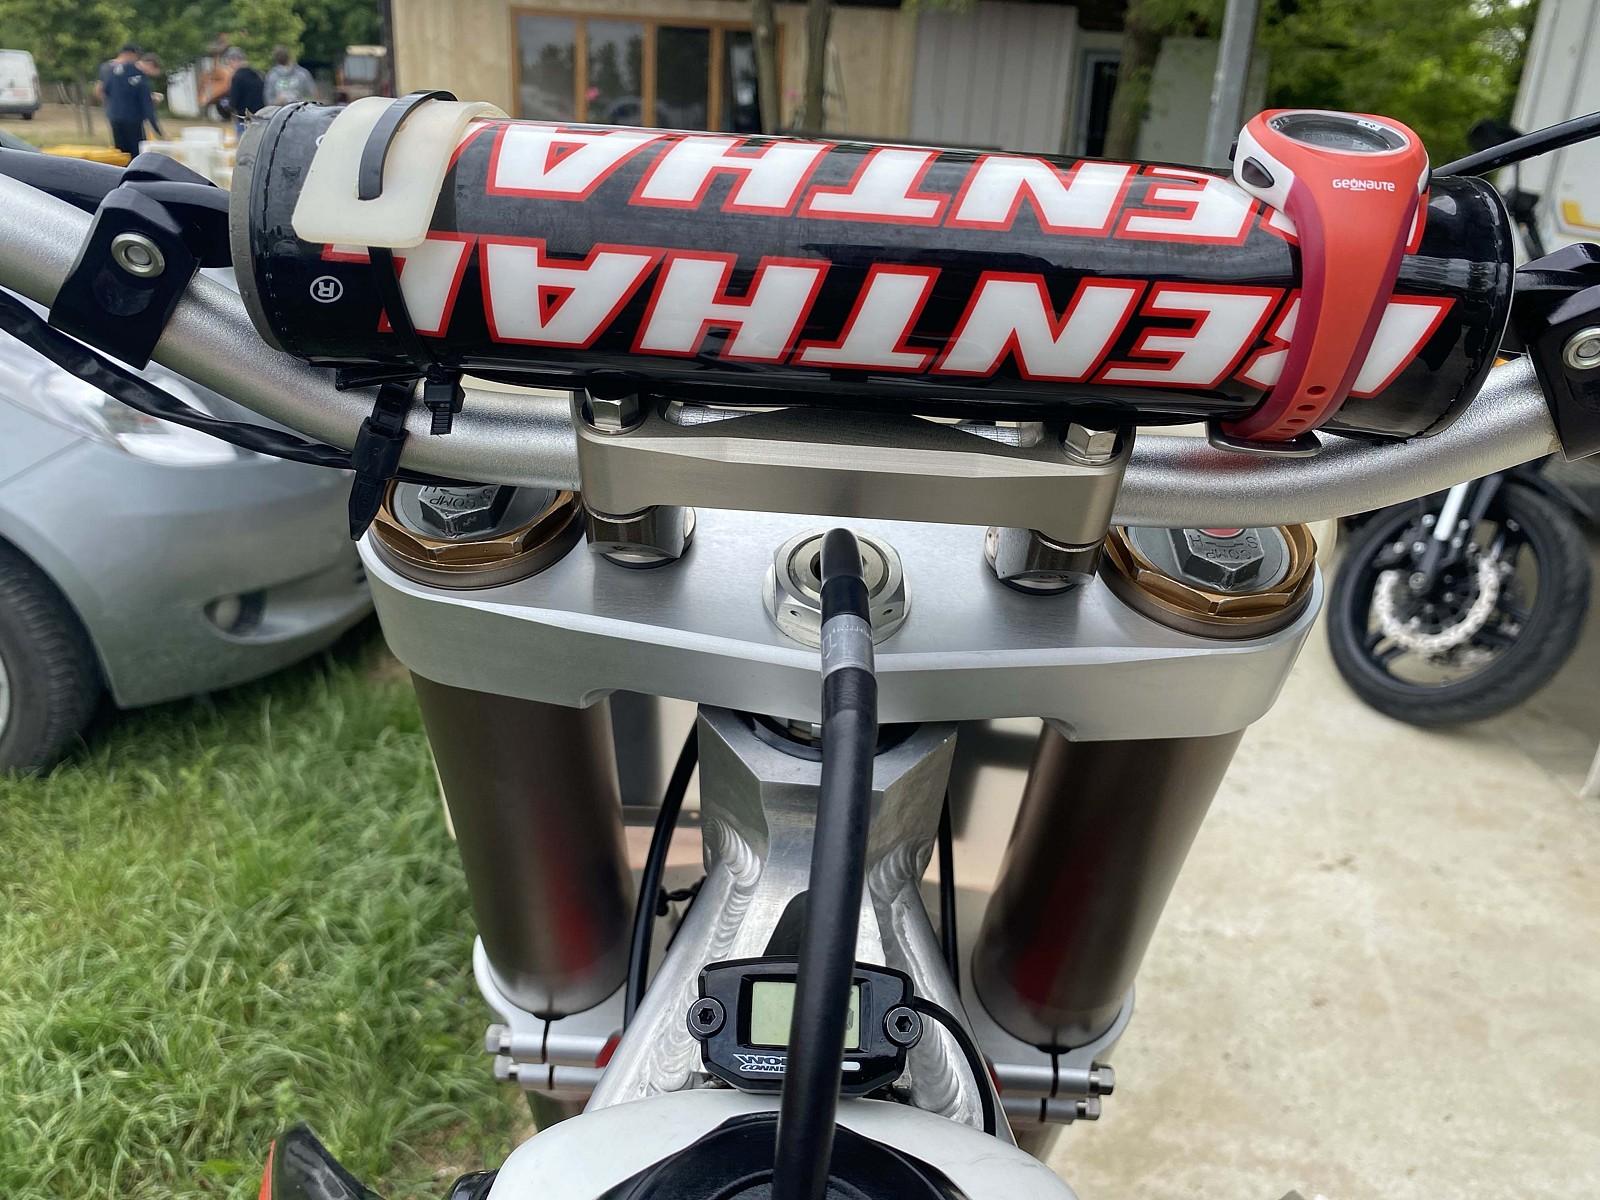 triple clamp HRC replica - Debegio - Motocross Pictures - Vital MX